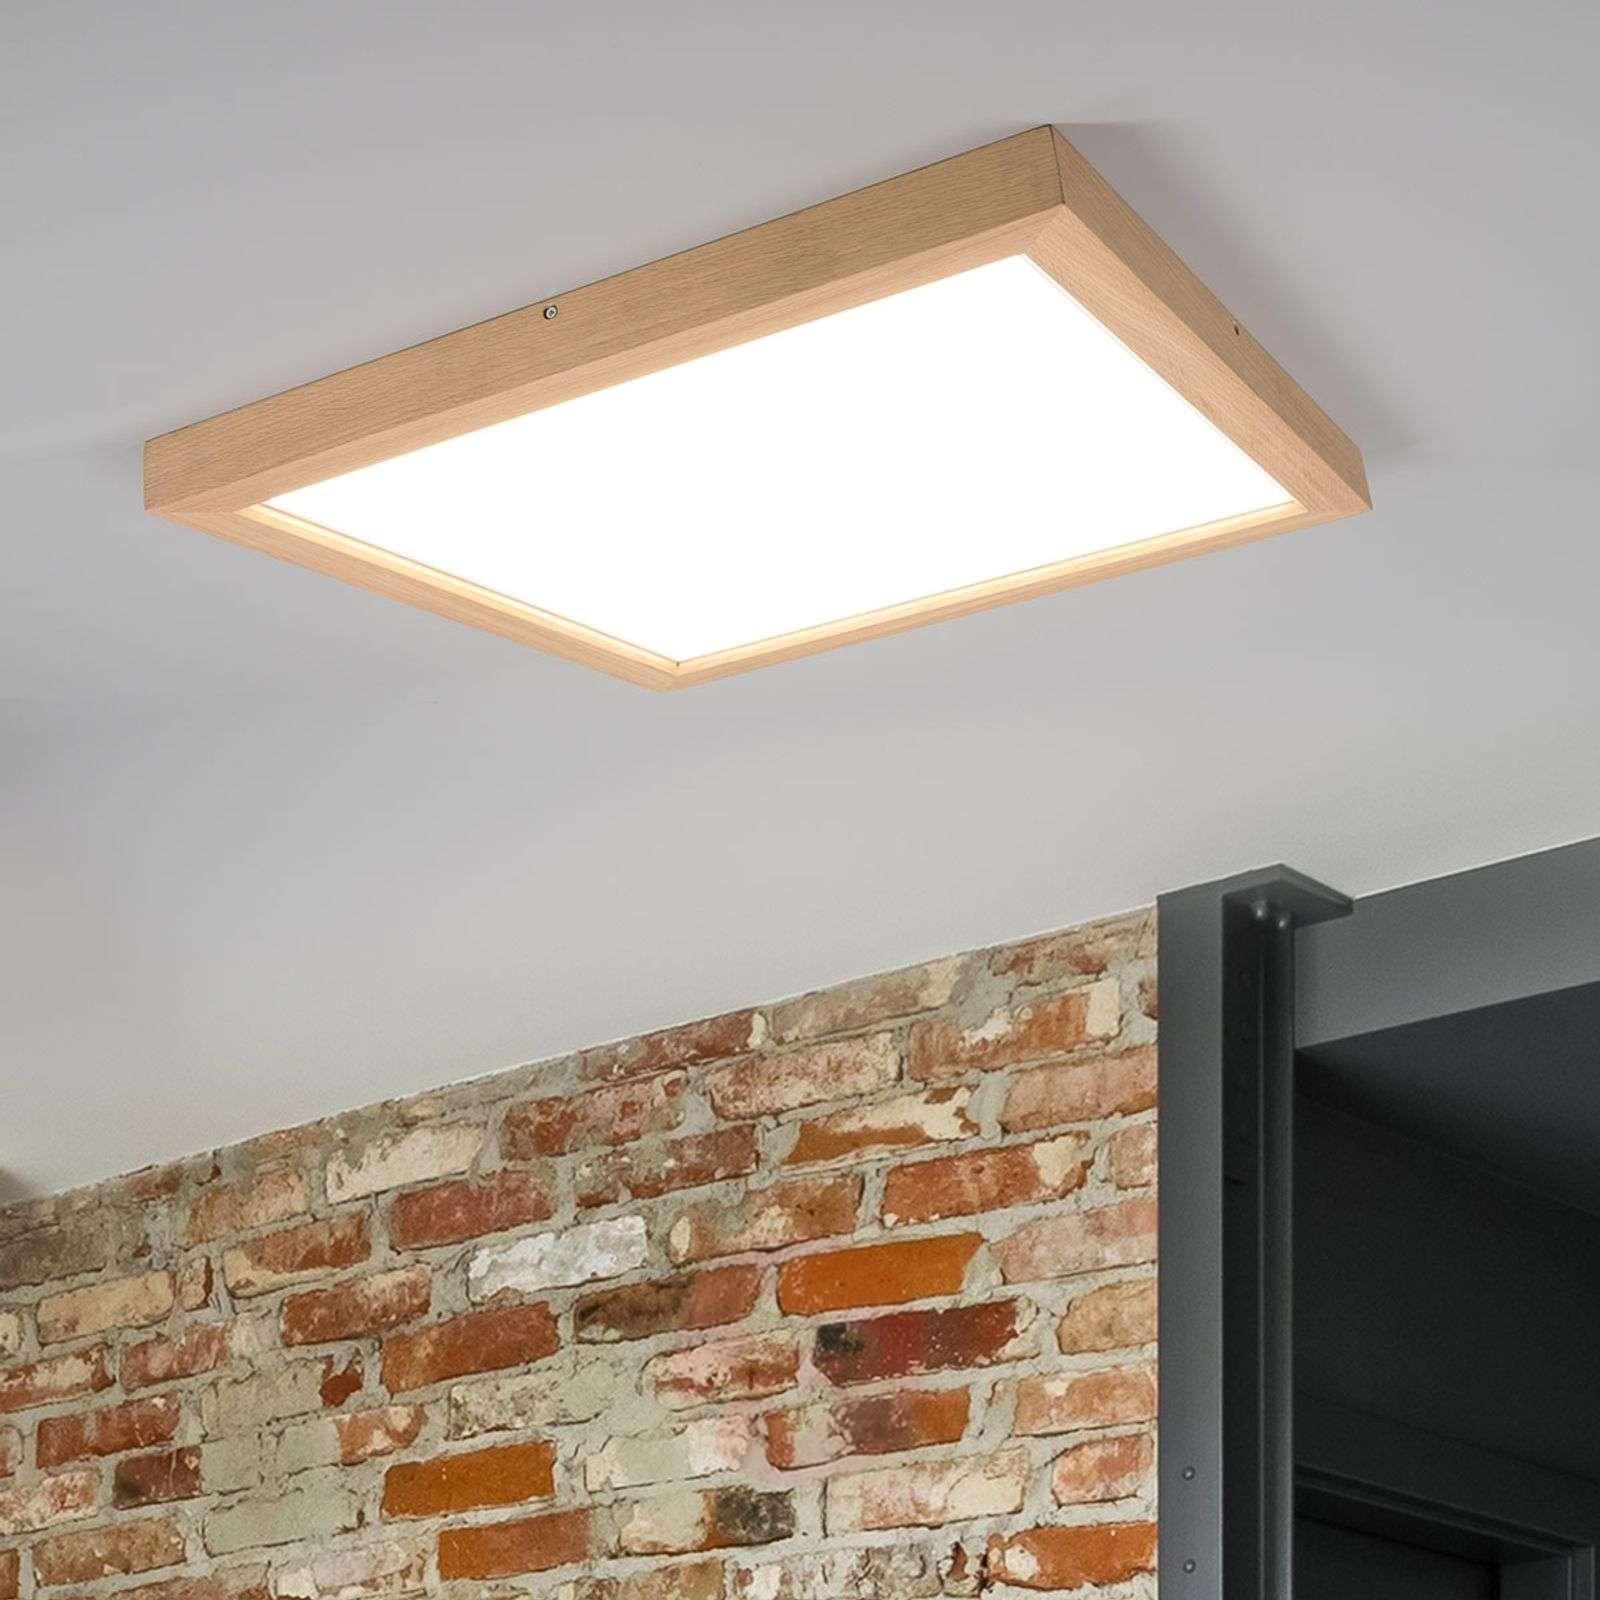 Square LED oak ceiling light Addison-8592018-01